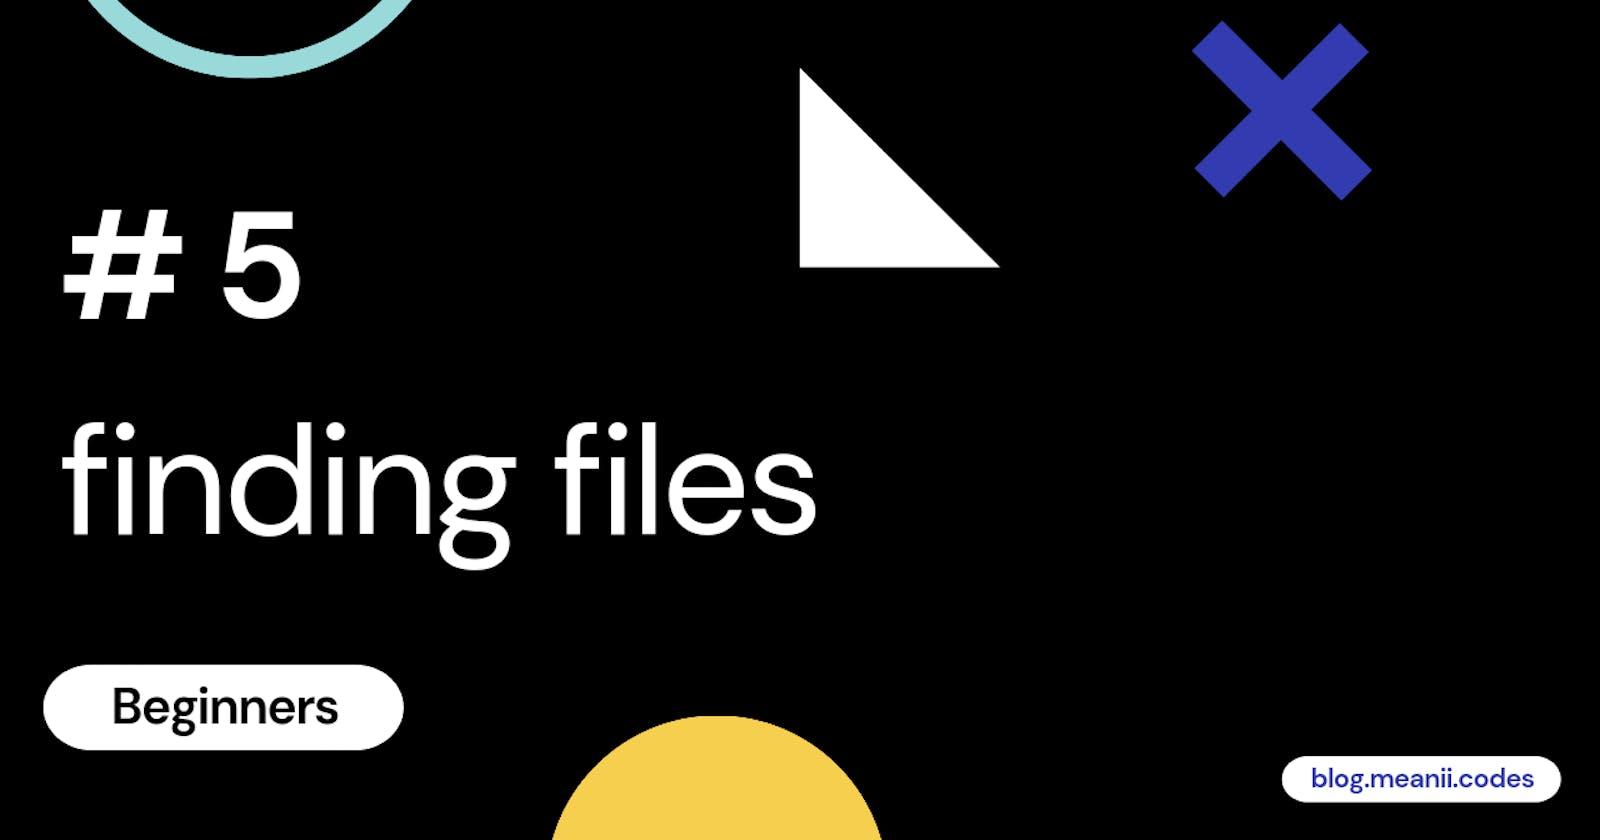 # 5 Beginners - finding files